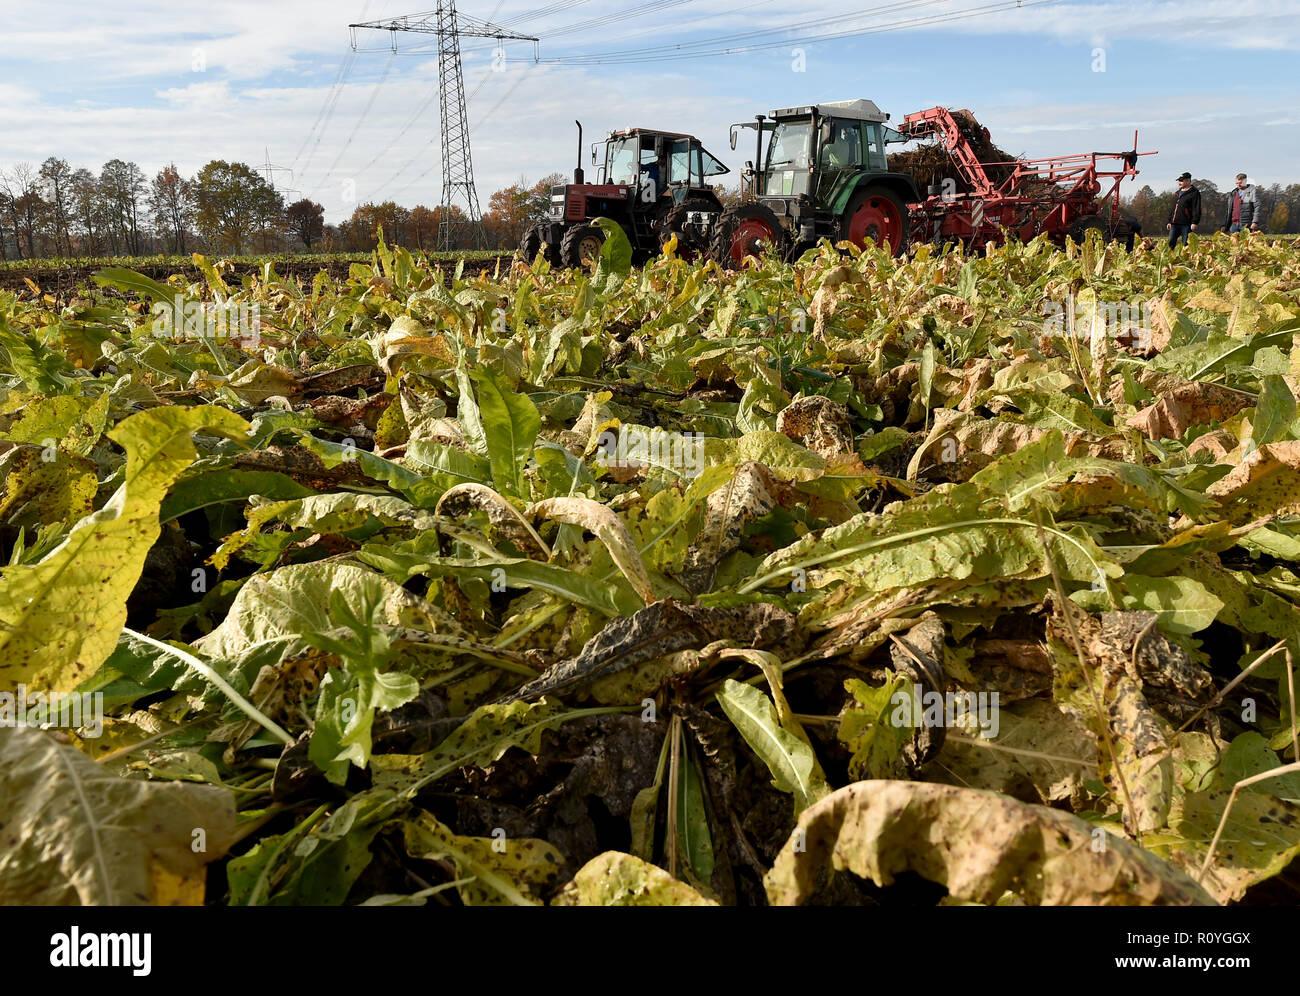 08 November 2018, Brandenburg, Lübbenau: The harvesting season for Spreewald horseradish starts on the fields of the 'Spreewald' vegetable farm. Due to the dry summer, harvest losses of up to 25 percent are expected. Photo: Bernd Settnik/dpa-Zentralbild/dpa - Stock Image